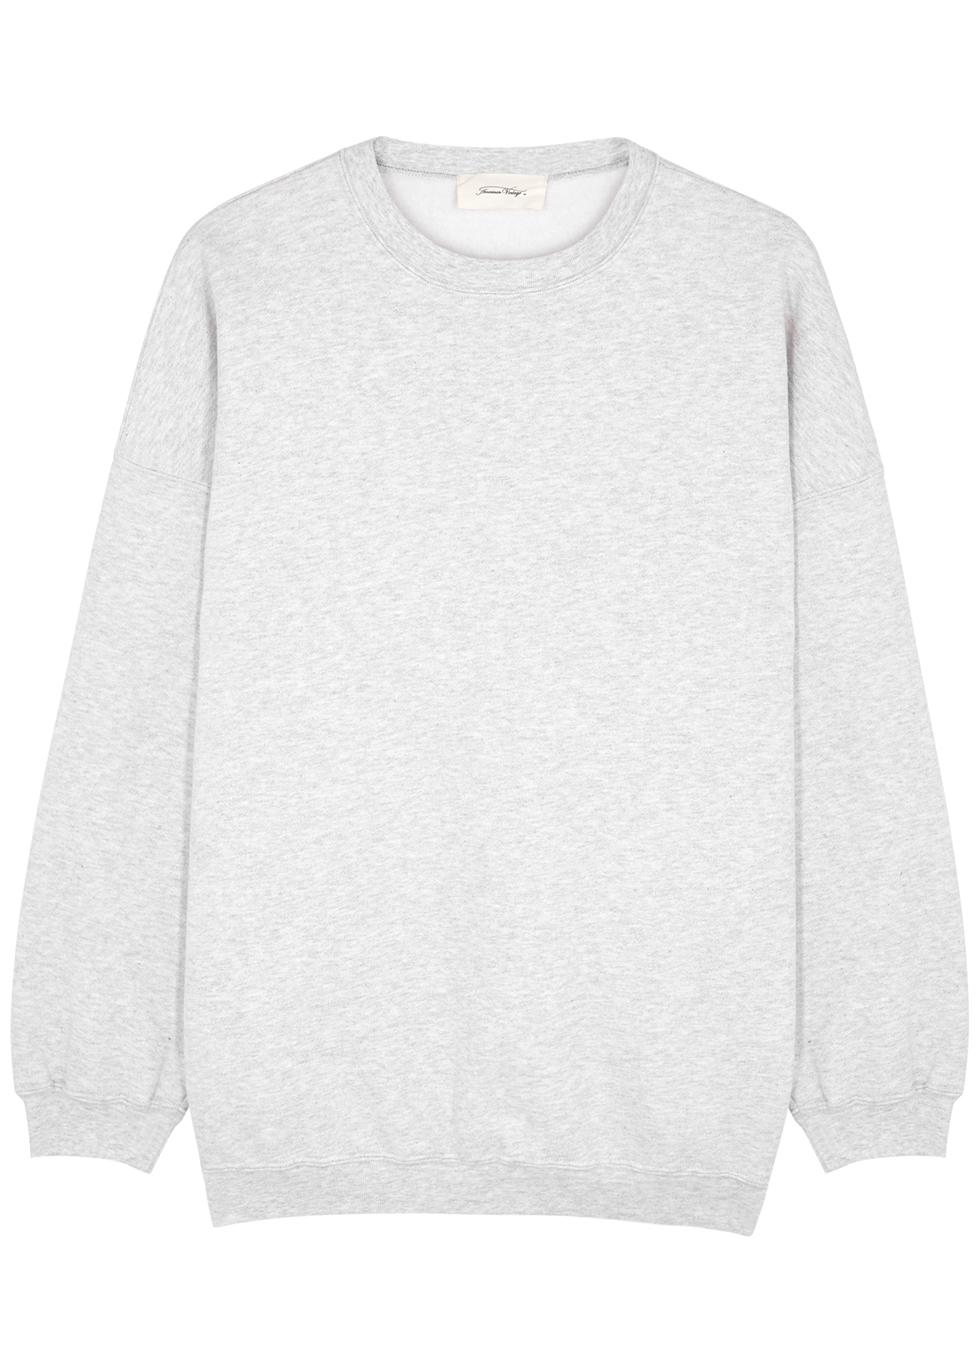 Baetown grey mélange jersey sweatshirt